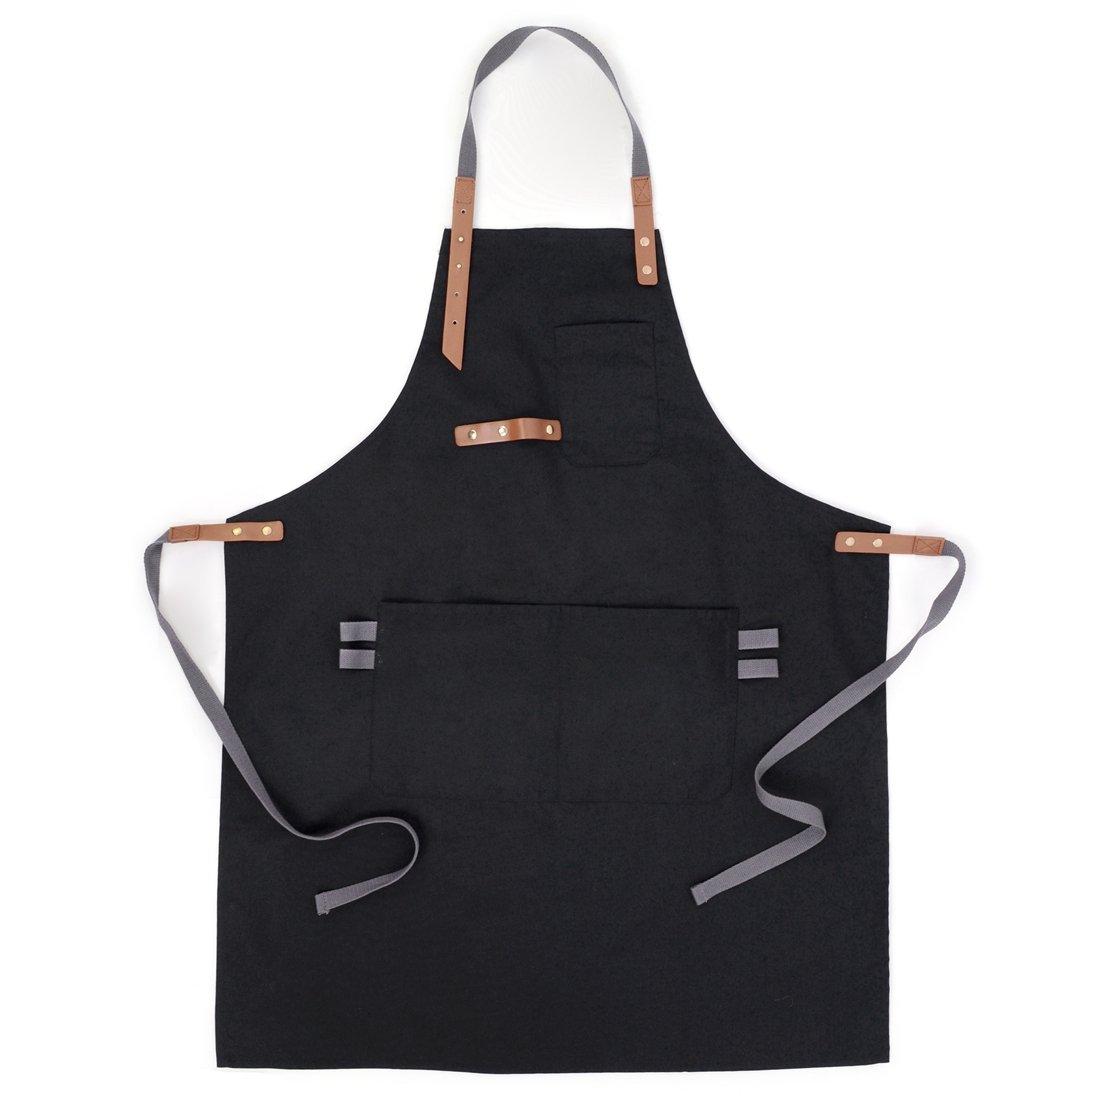 xianghengエプロンユーティリティ調節可能なネックウエストのレディースメンズポケット付きChelf Waitress Painting ブラック UC0181/XHUS1  ブラック B0779V22MT